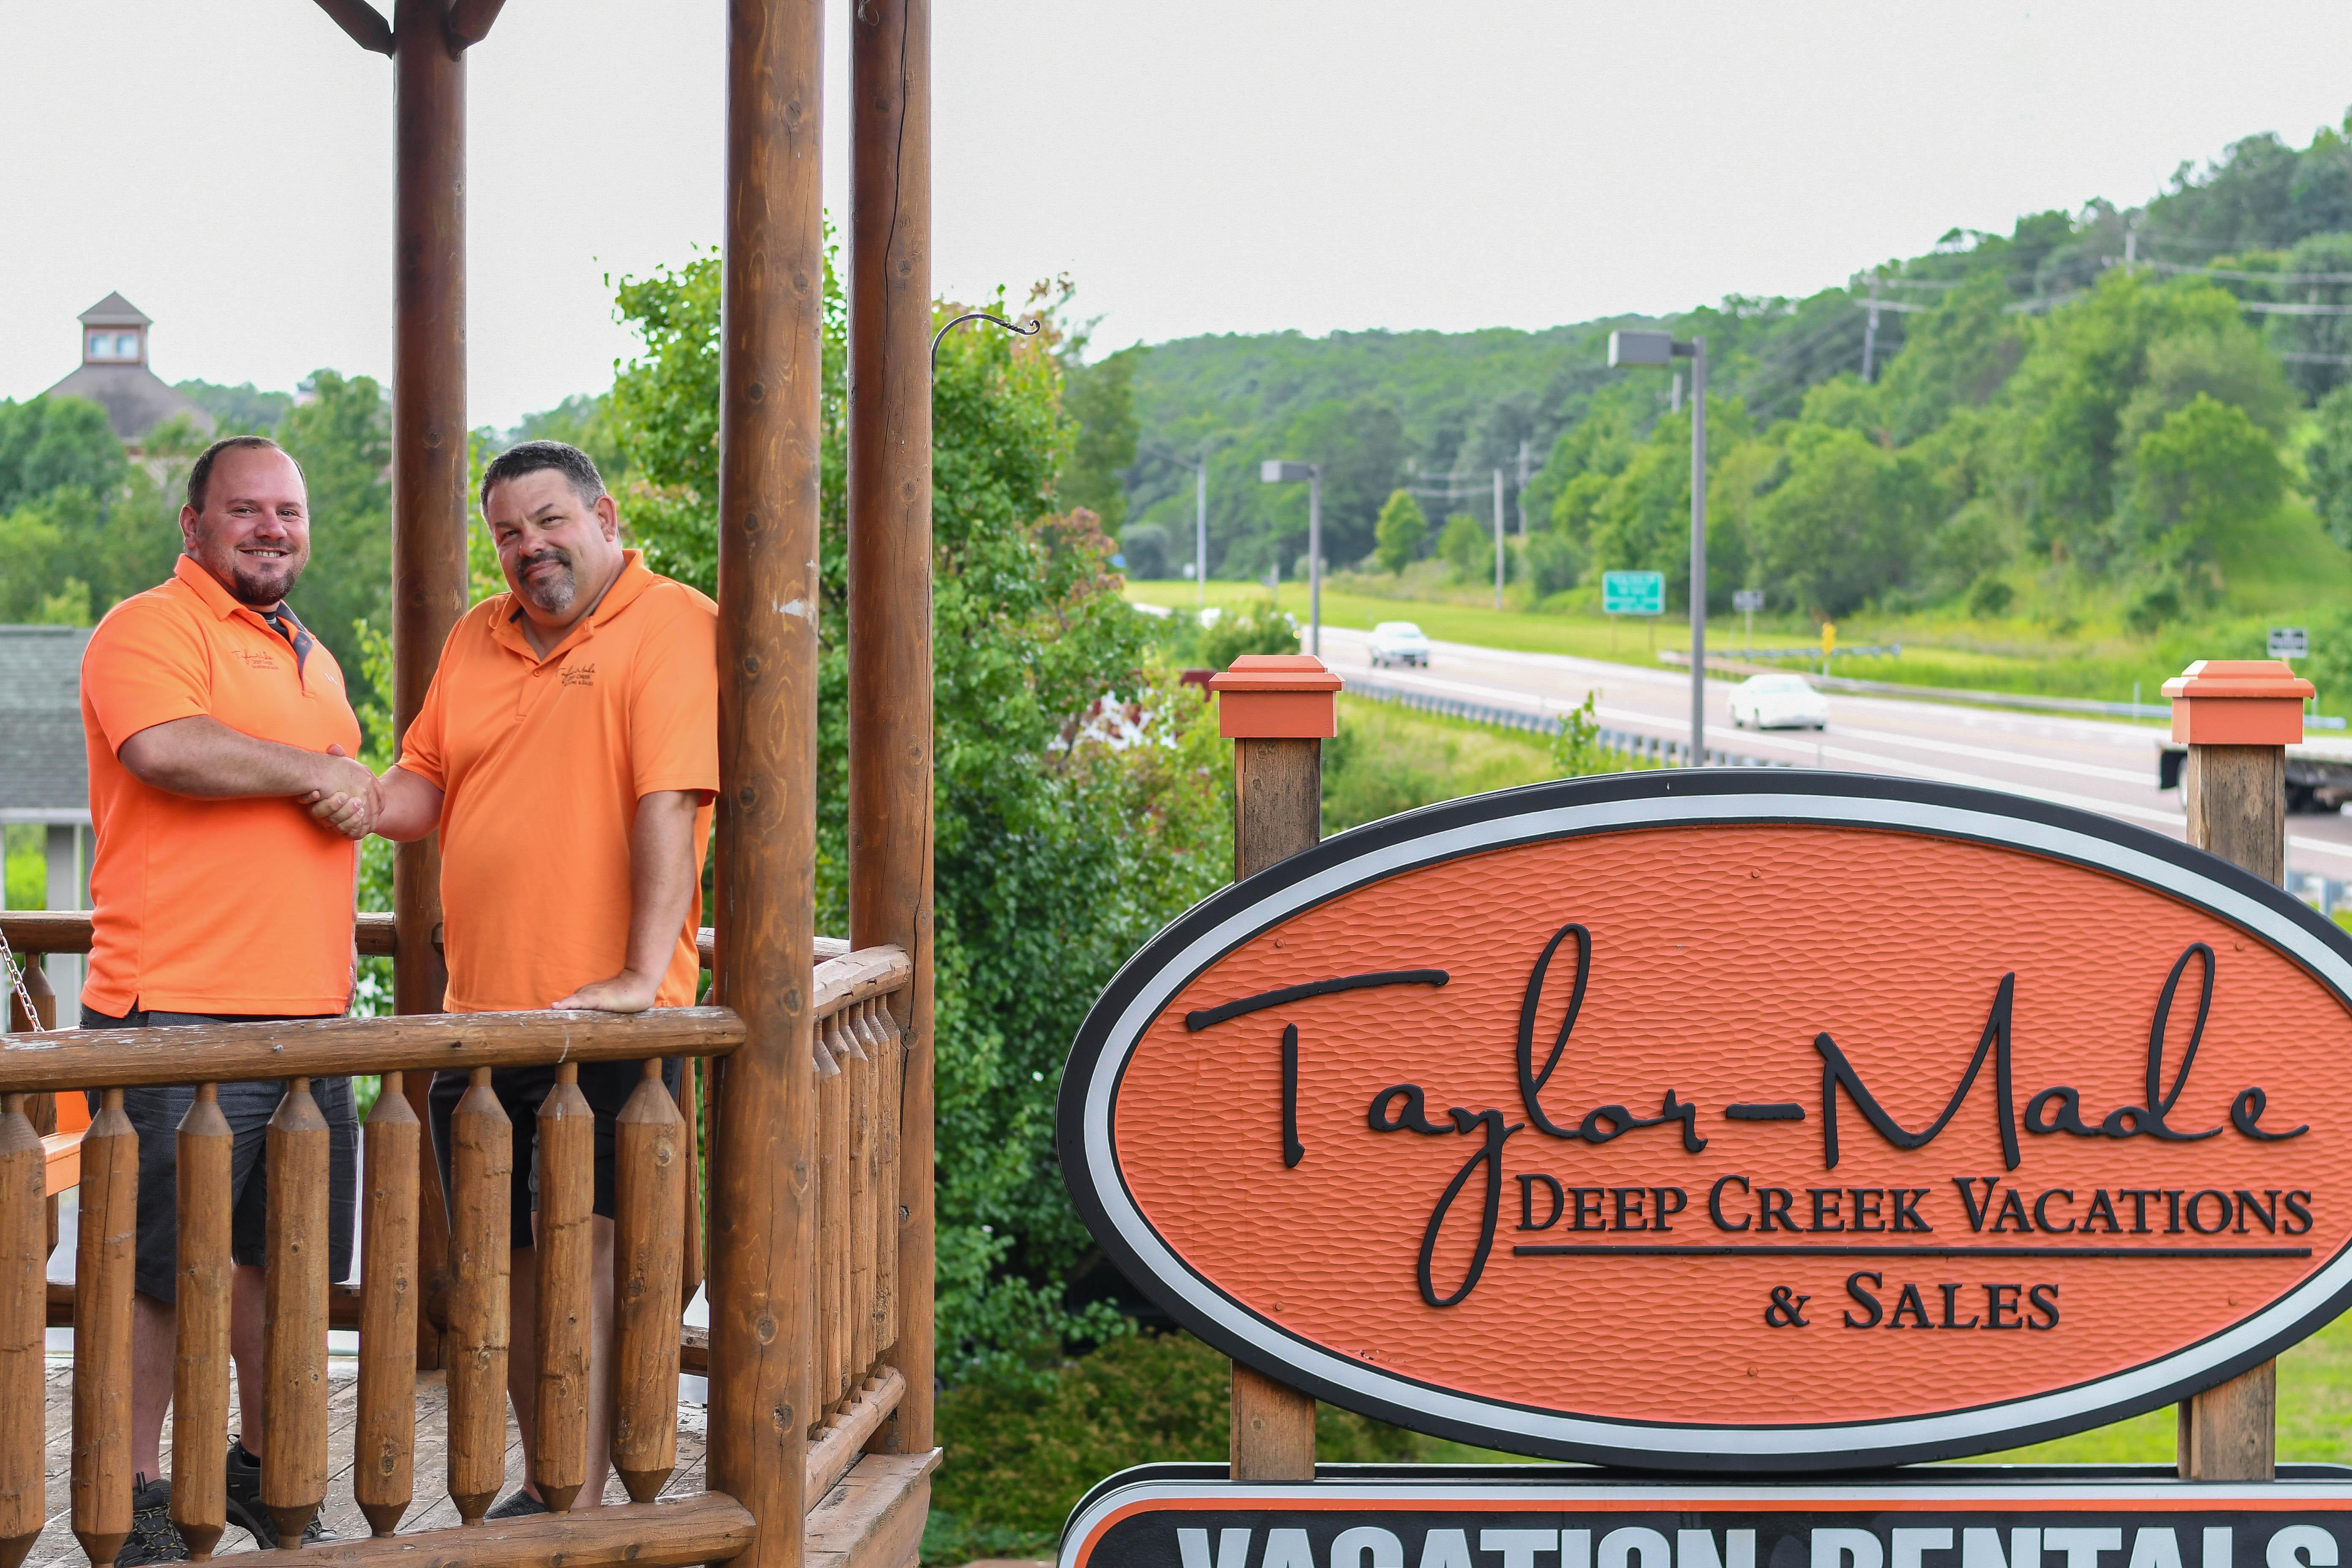 Deep Creek Real Estate Company